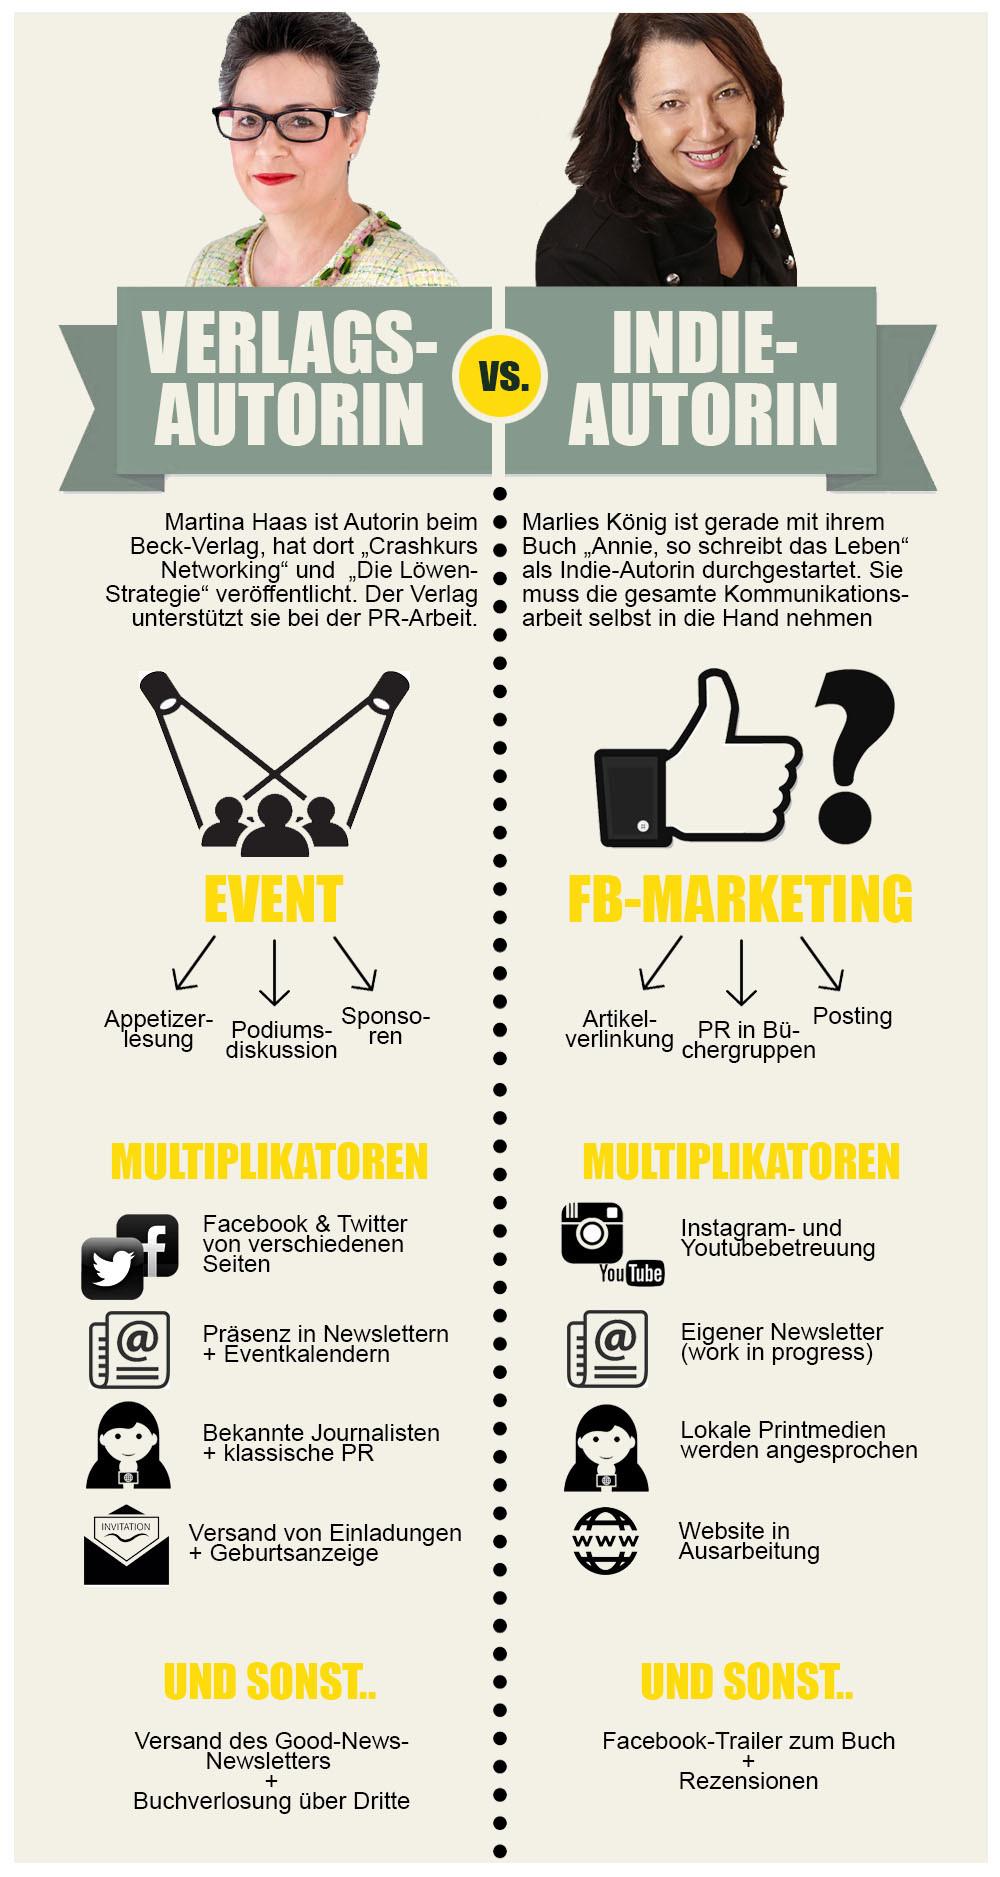 Verlagsautorin vs. Indie-Autorin; Kommunikationsstrategien; Infographic; Andrea Alton, PR-Coach - PR selber machen